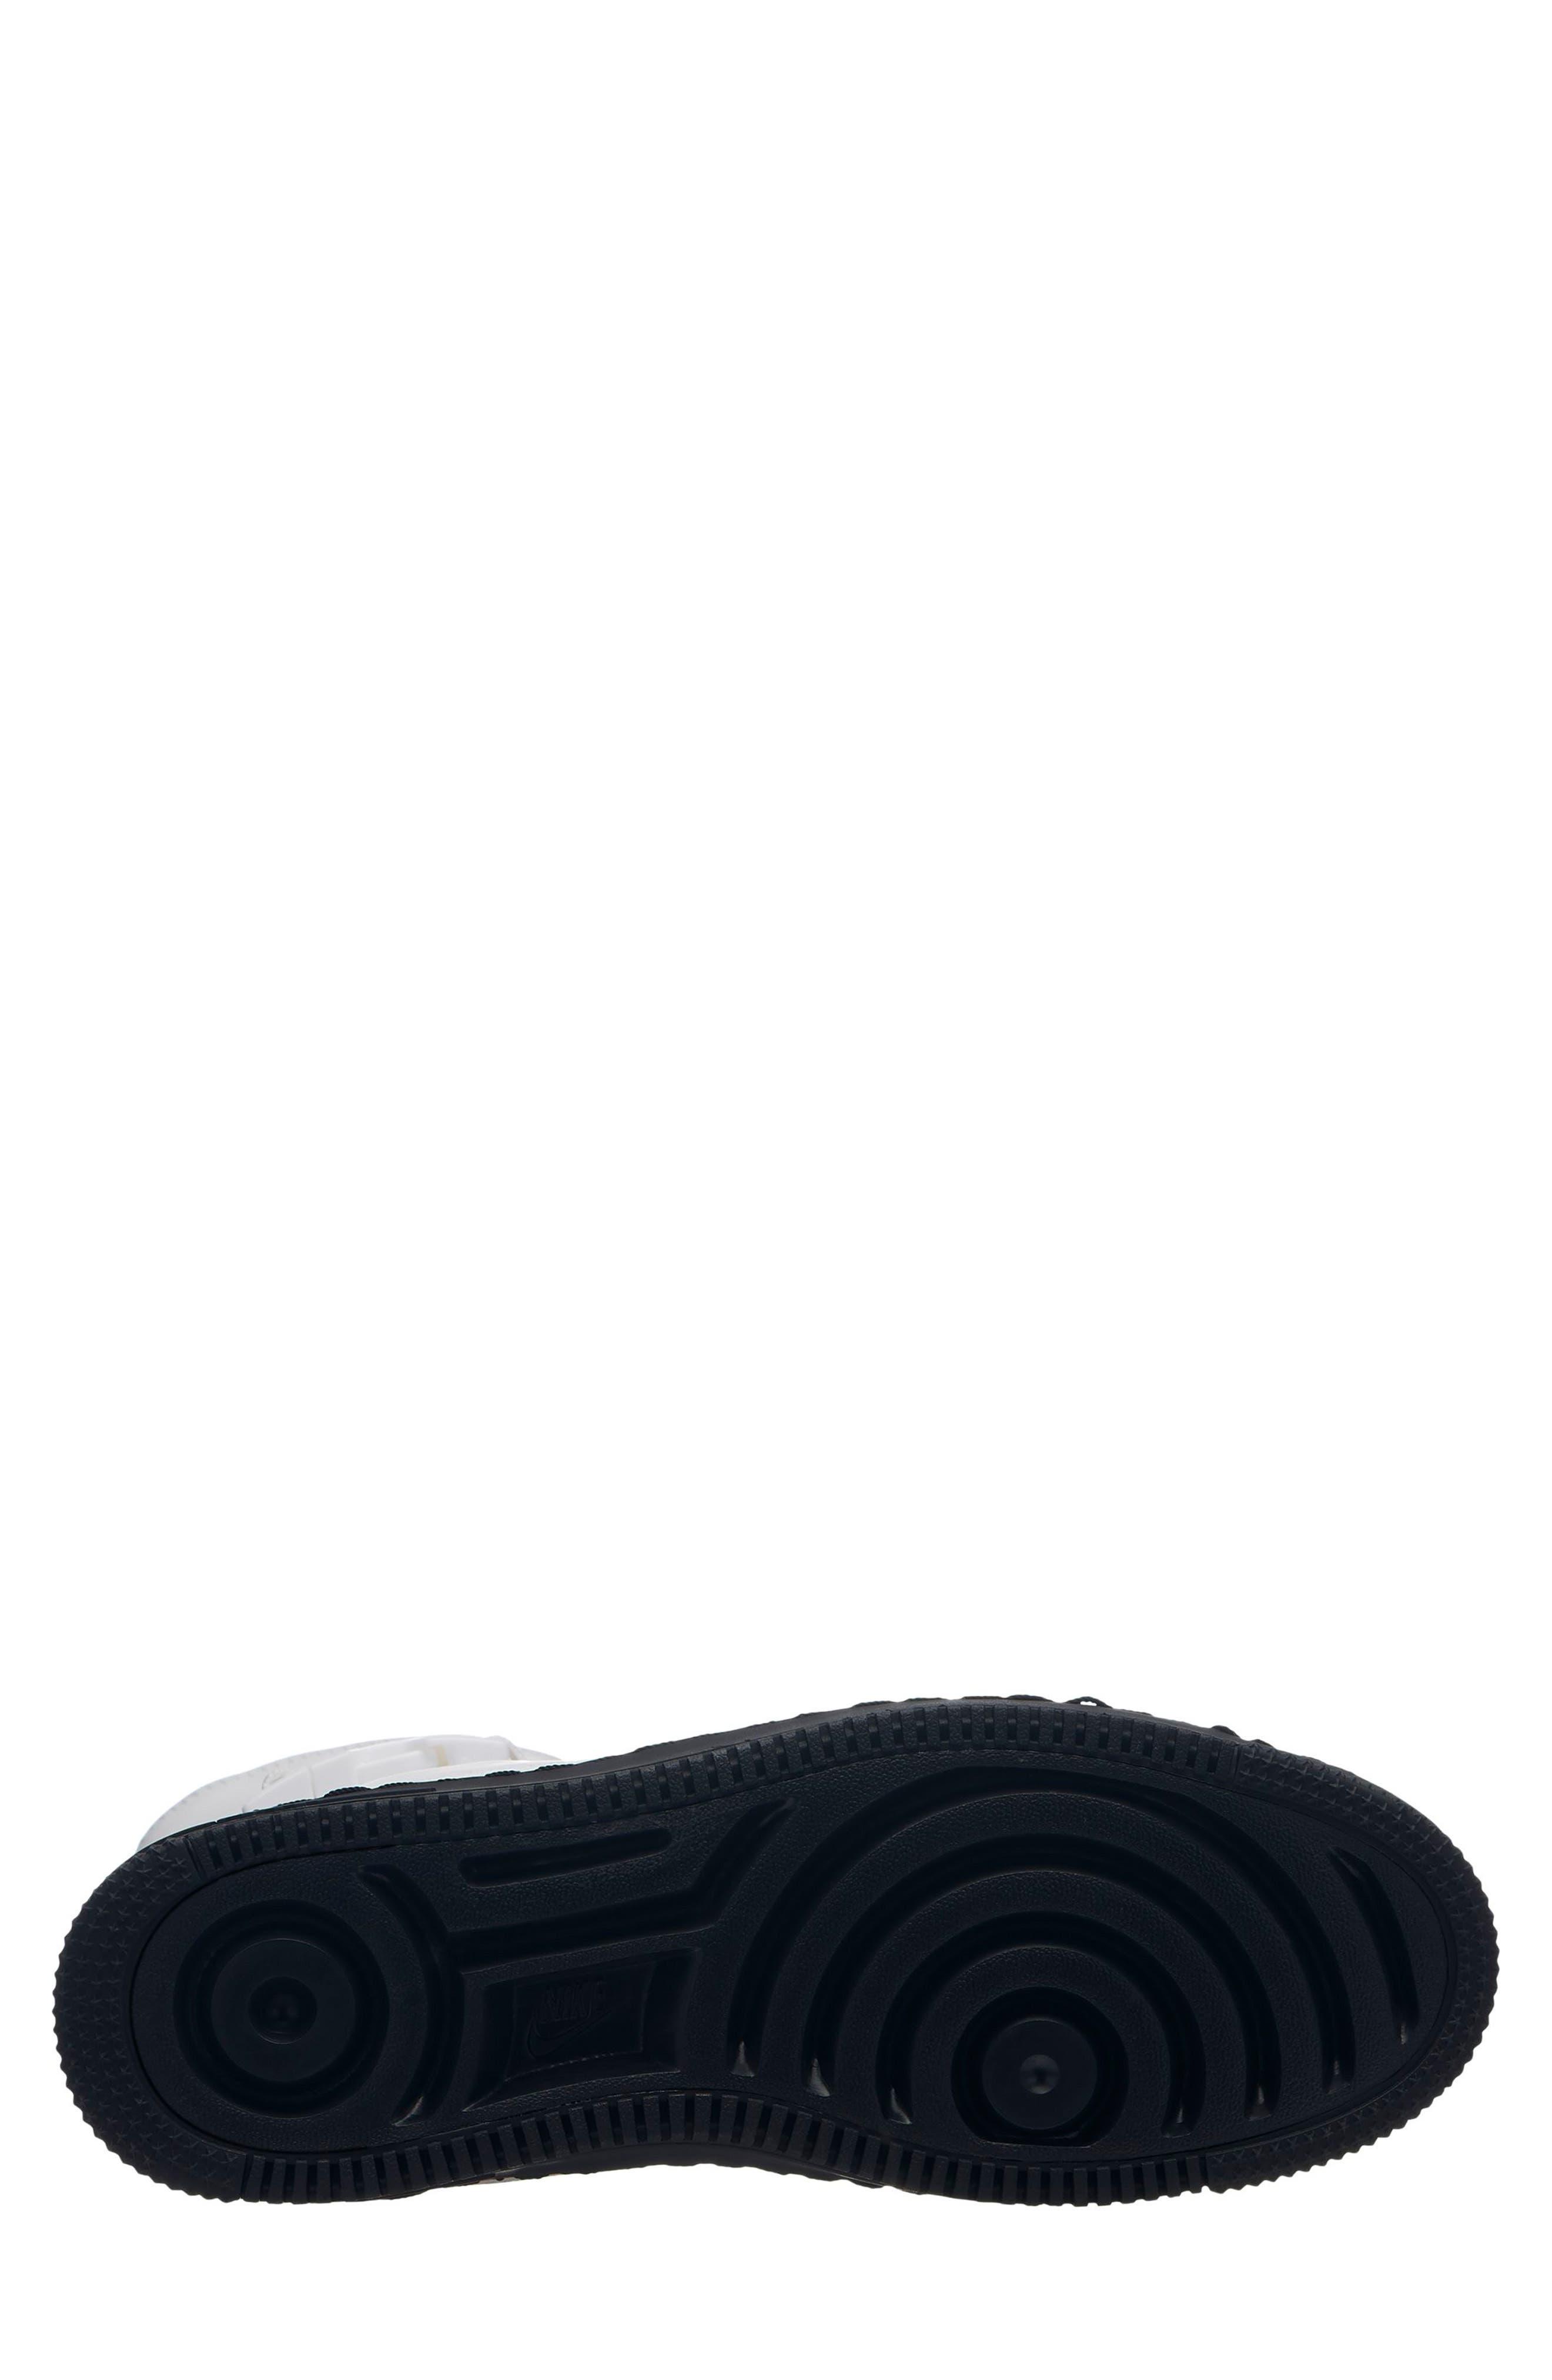 Air Force 1 Sage High Platform Sneaker,                             Alternate thumbnail 2, color,                             WHITE/ WHITE/ BLACK